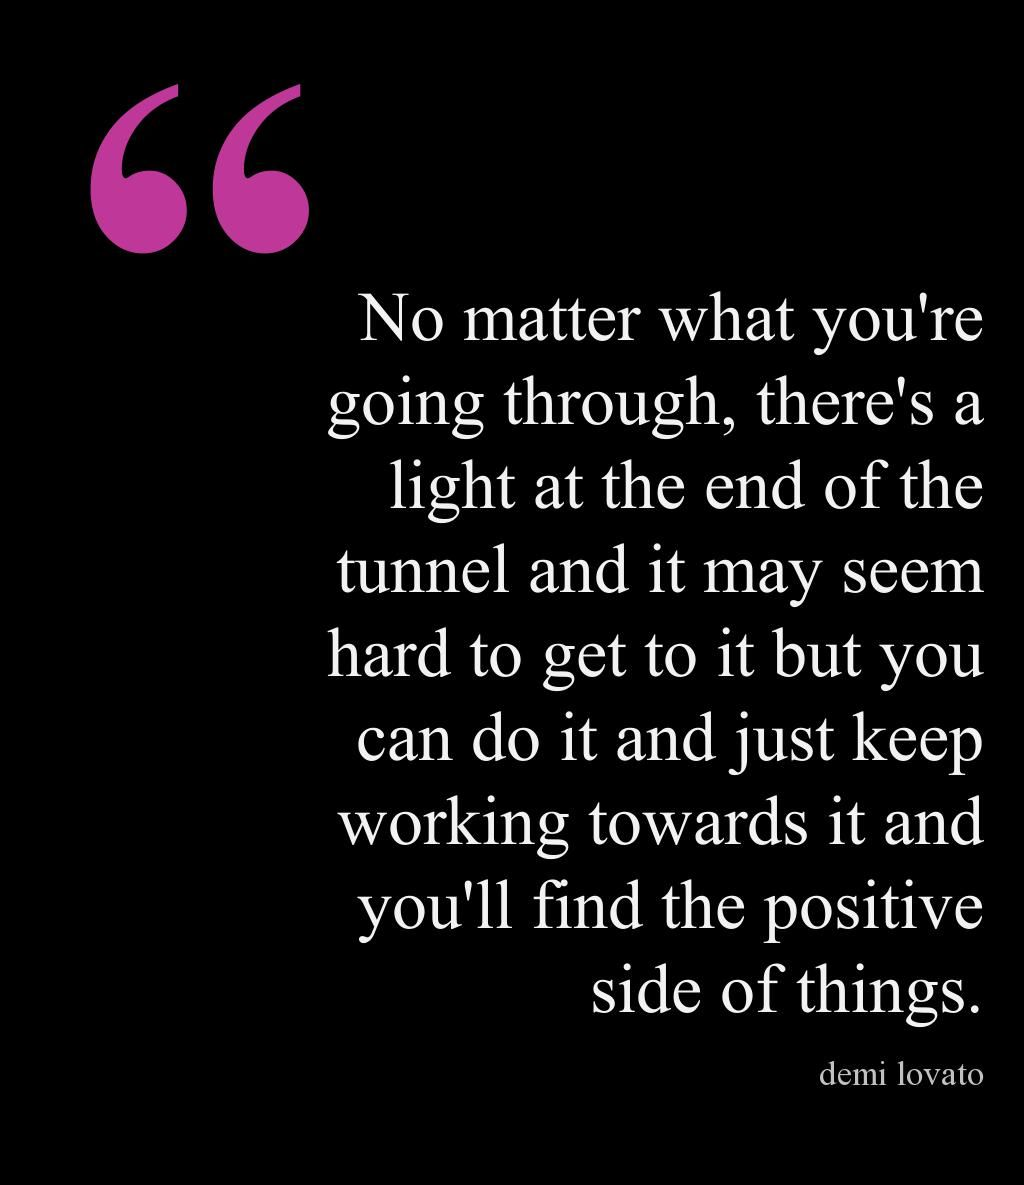 Demi Lovato Inspirational Quote Ana Shoemaker Demi Lovato Quotes Motivational Quotes Inspirational Quotes